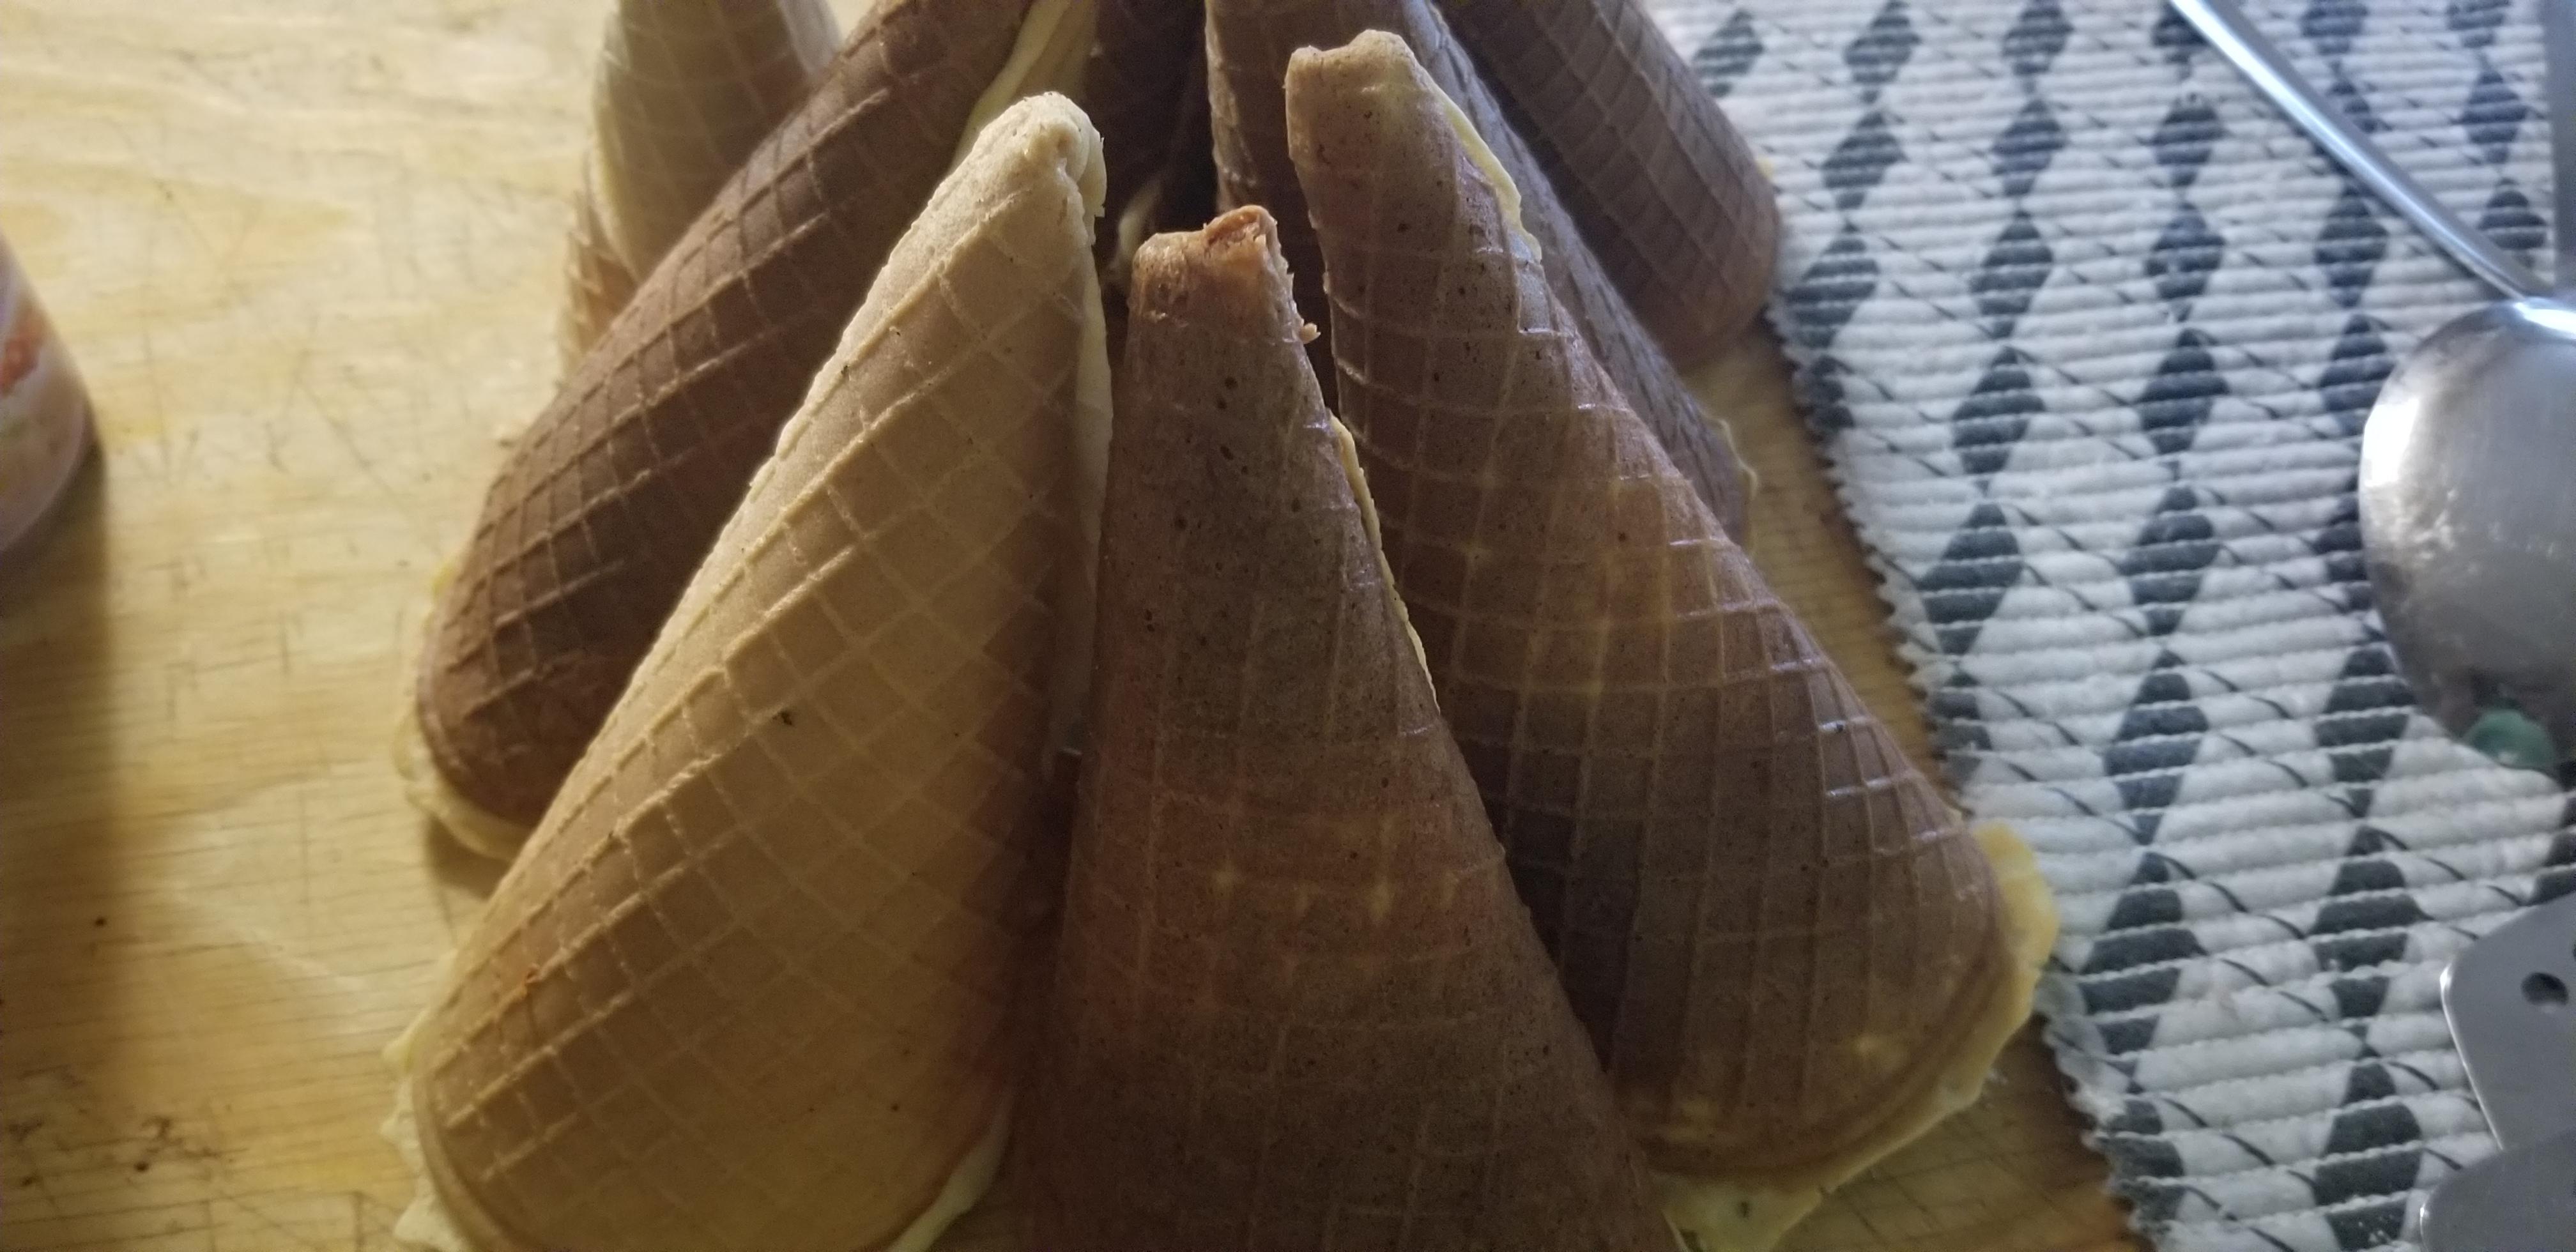 Homemade Ice Cream Cones Chef EDWR Fle